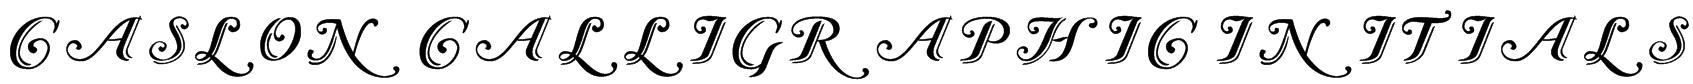 Caslon Calligraphic Initials Font